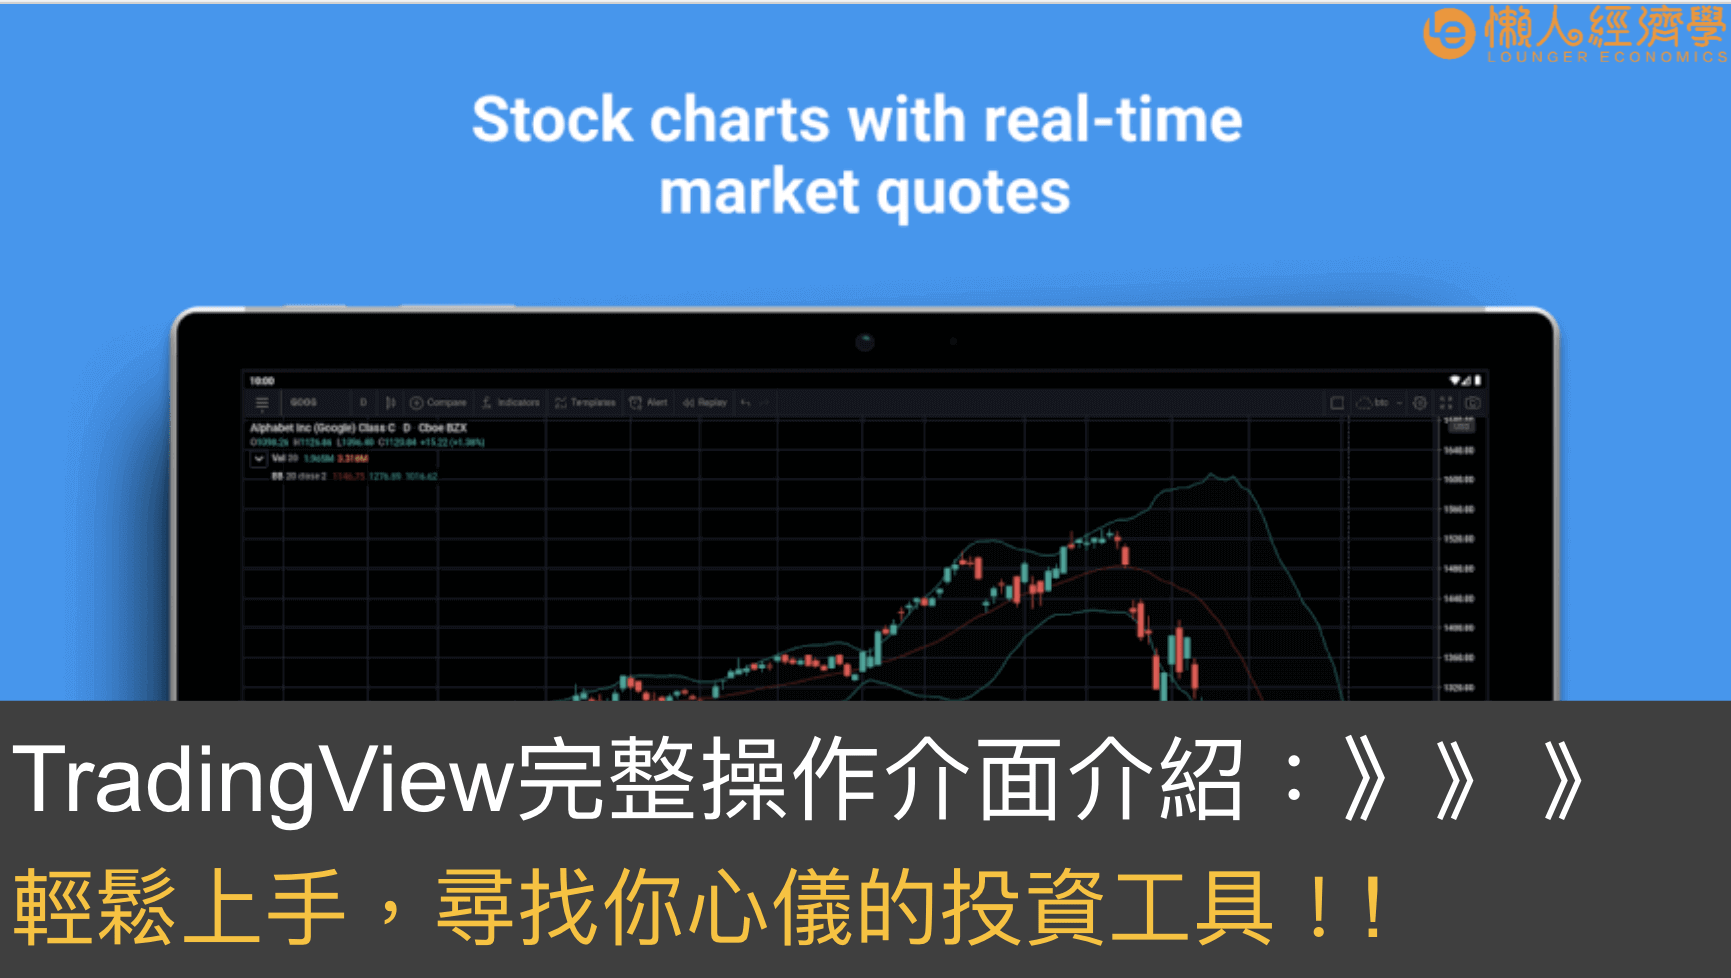 TradingView評價:操作介面與使用心得分享,一個輕鬆上手的看盤投資工具